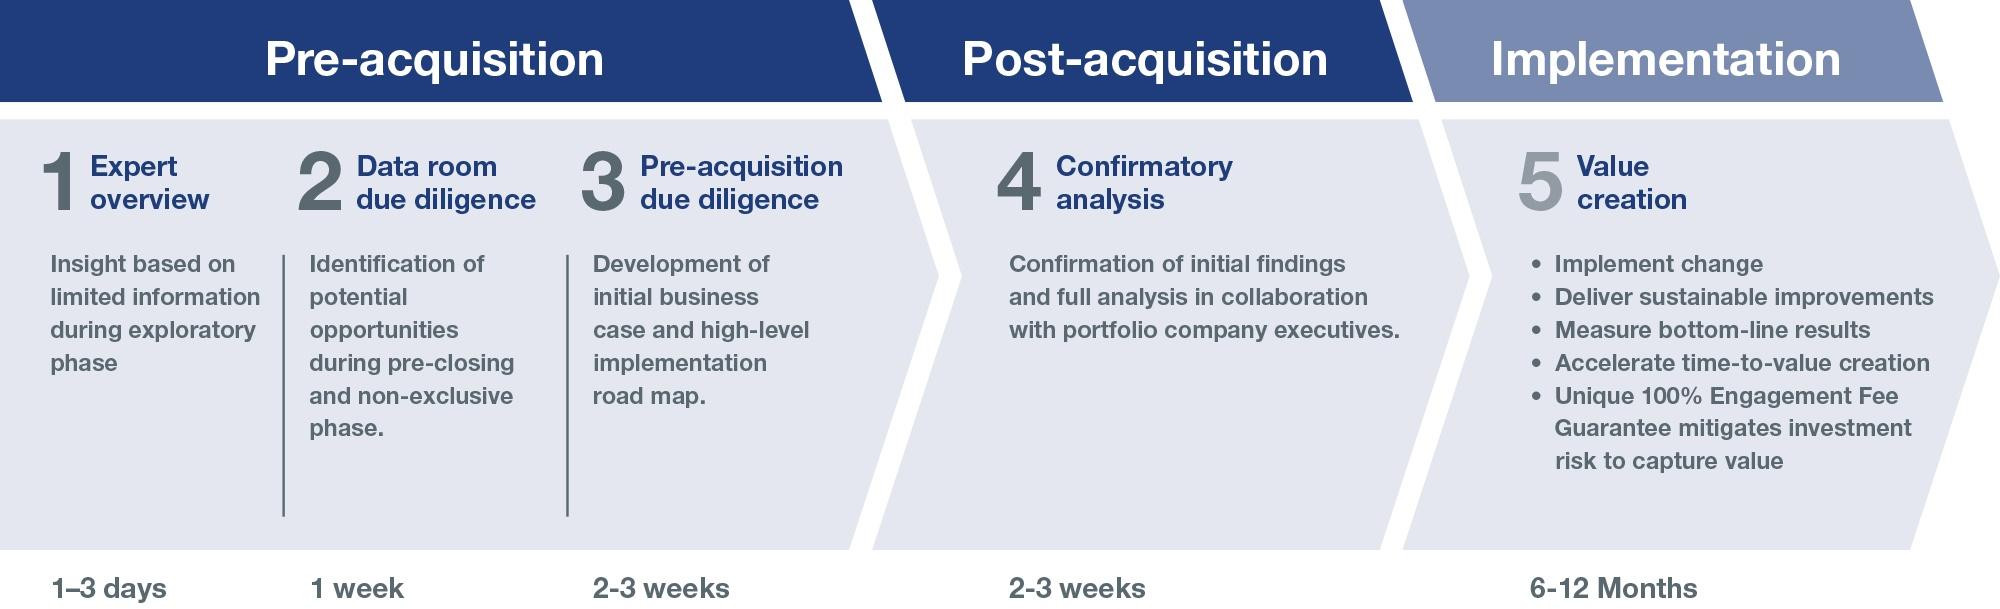 Acquisition Diagram.jpg